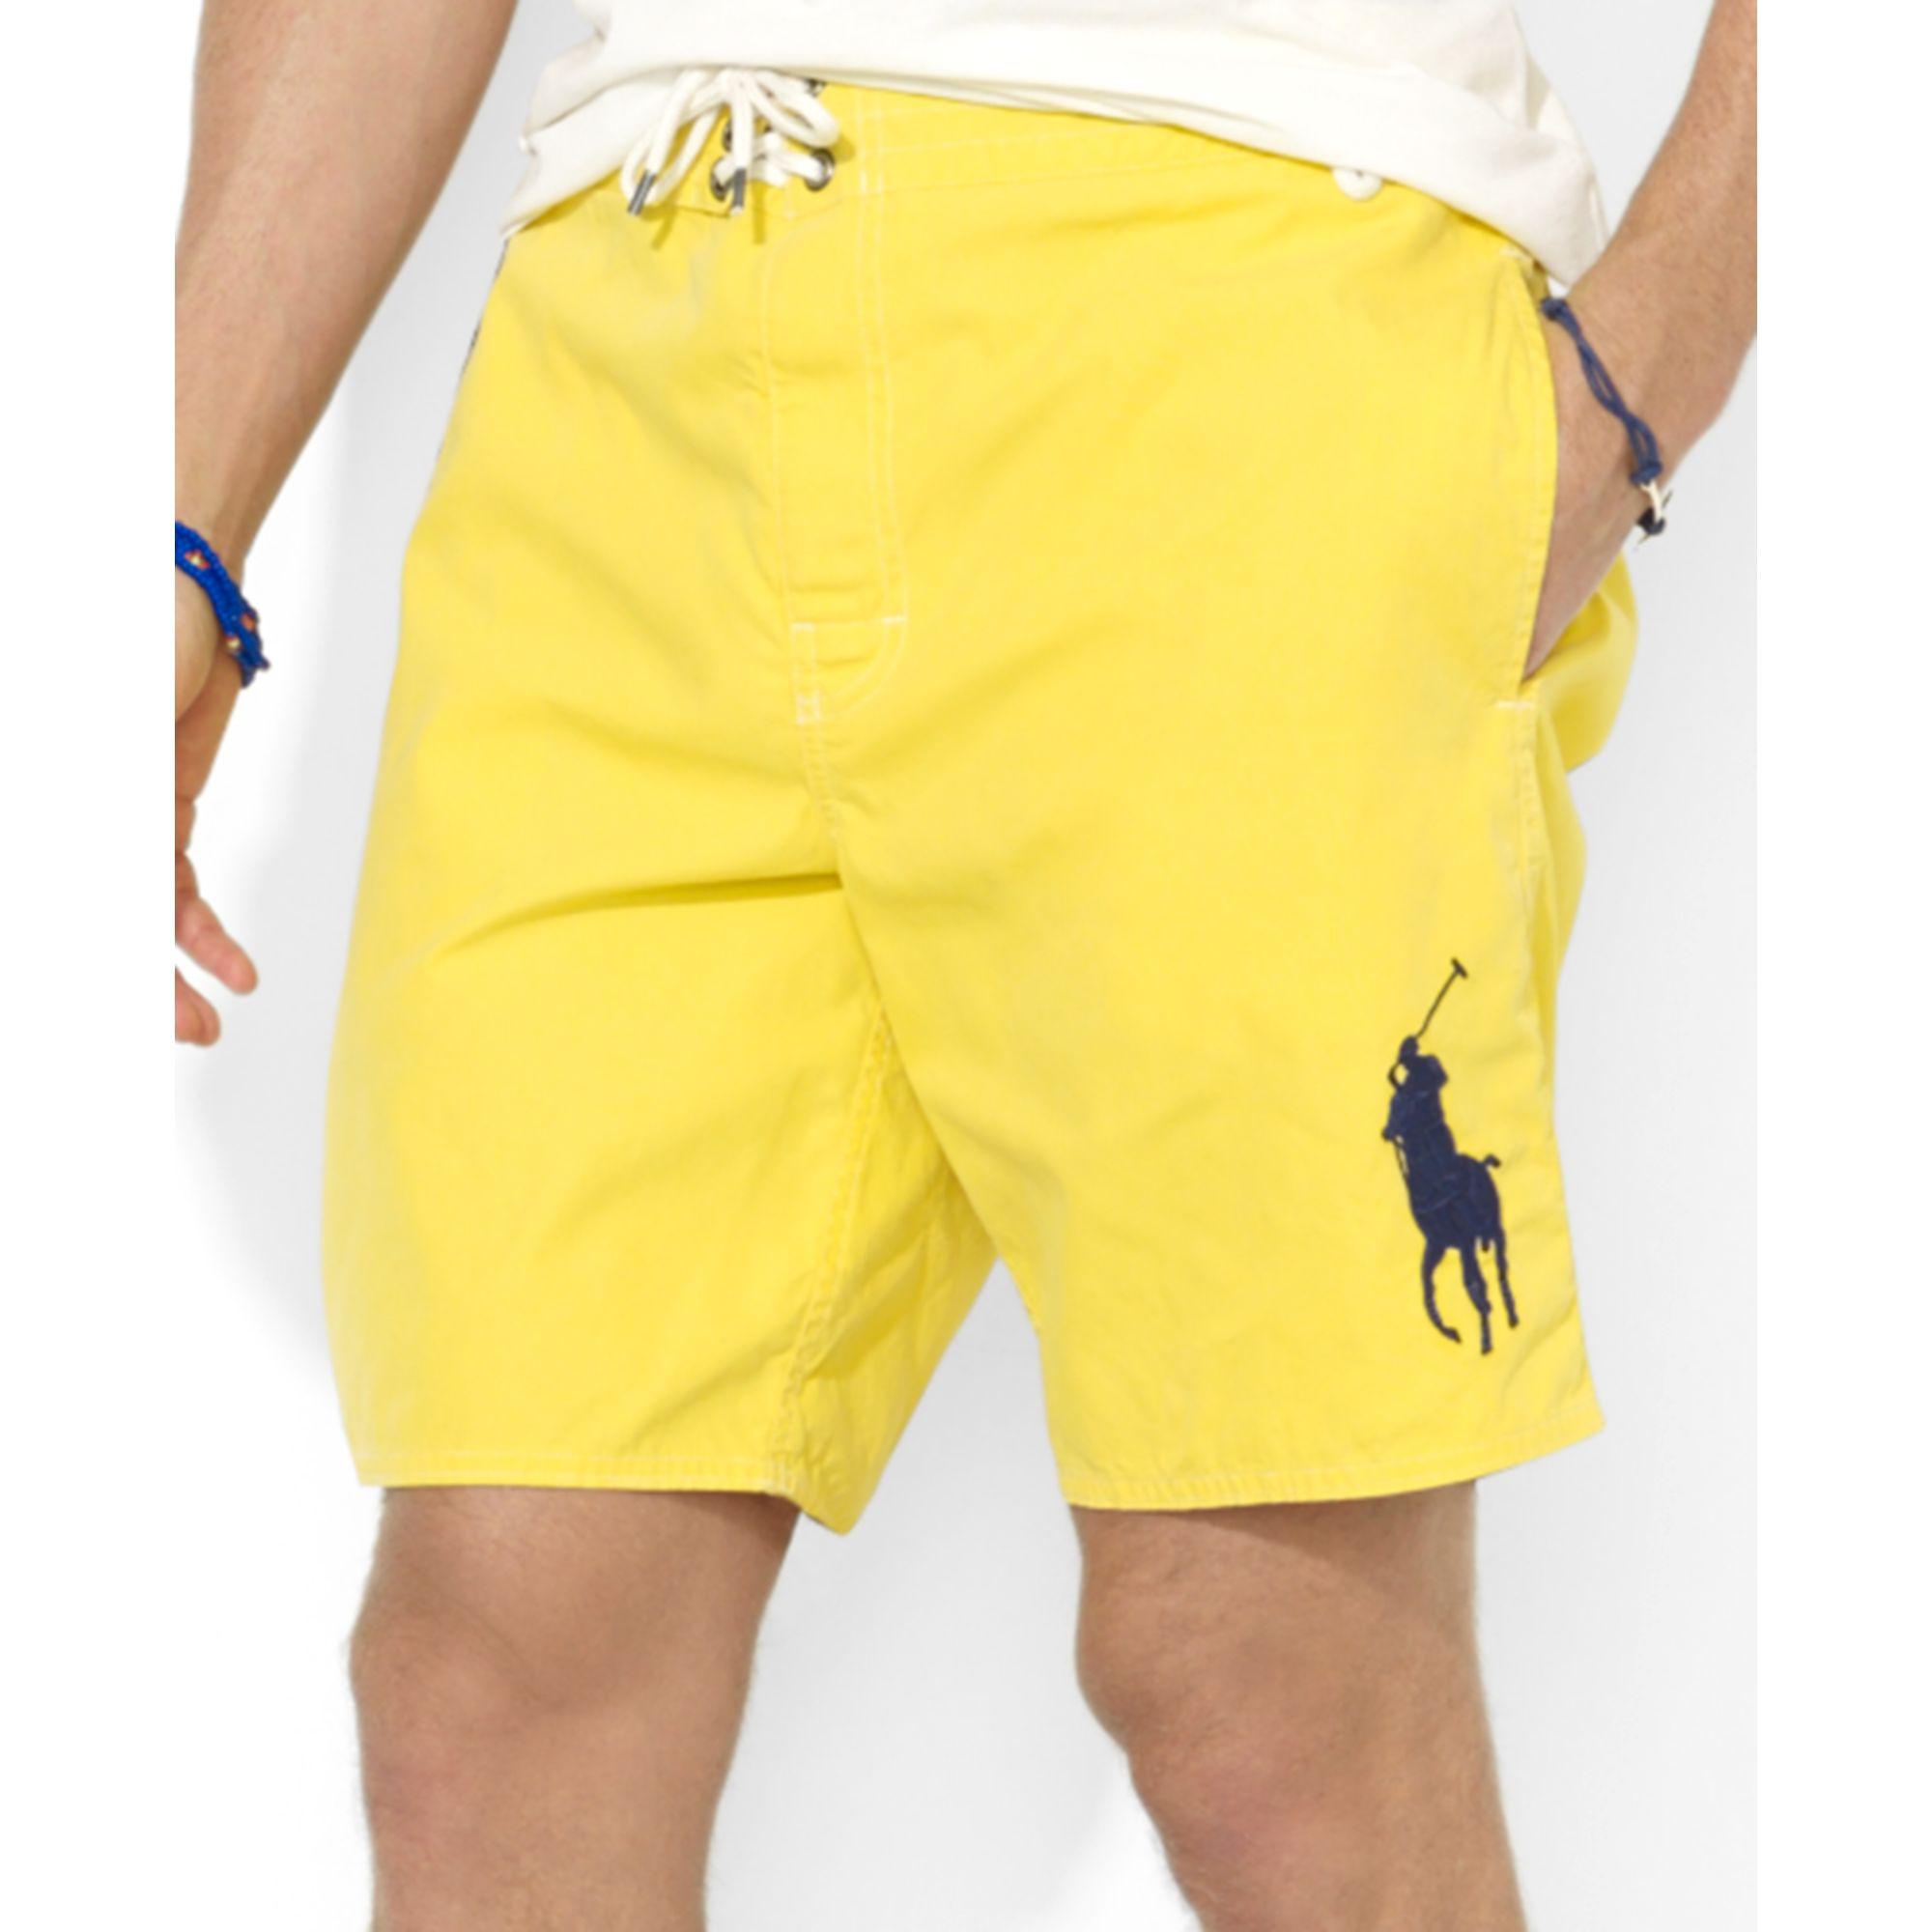 bd31de67f7f ... sale lyst ralph lauren polo sanibel big pony swim trunks in yellow for  men 31b55 85090